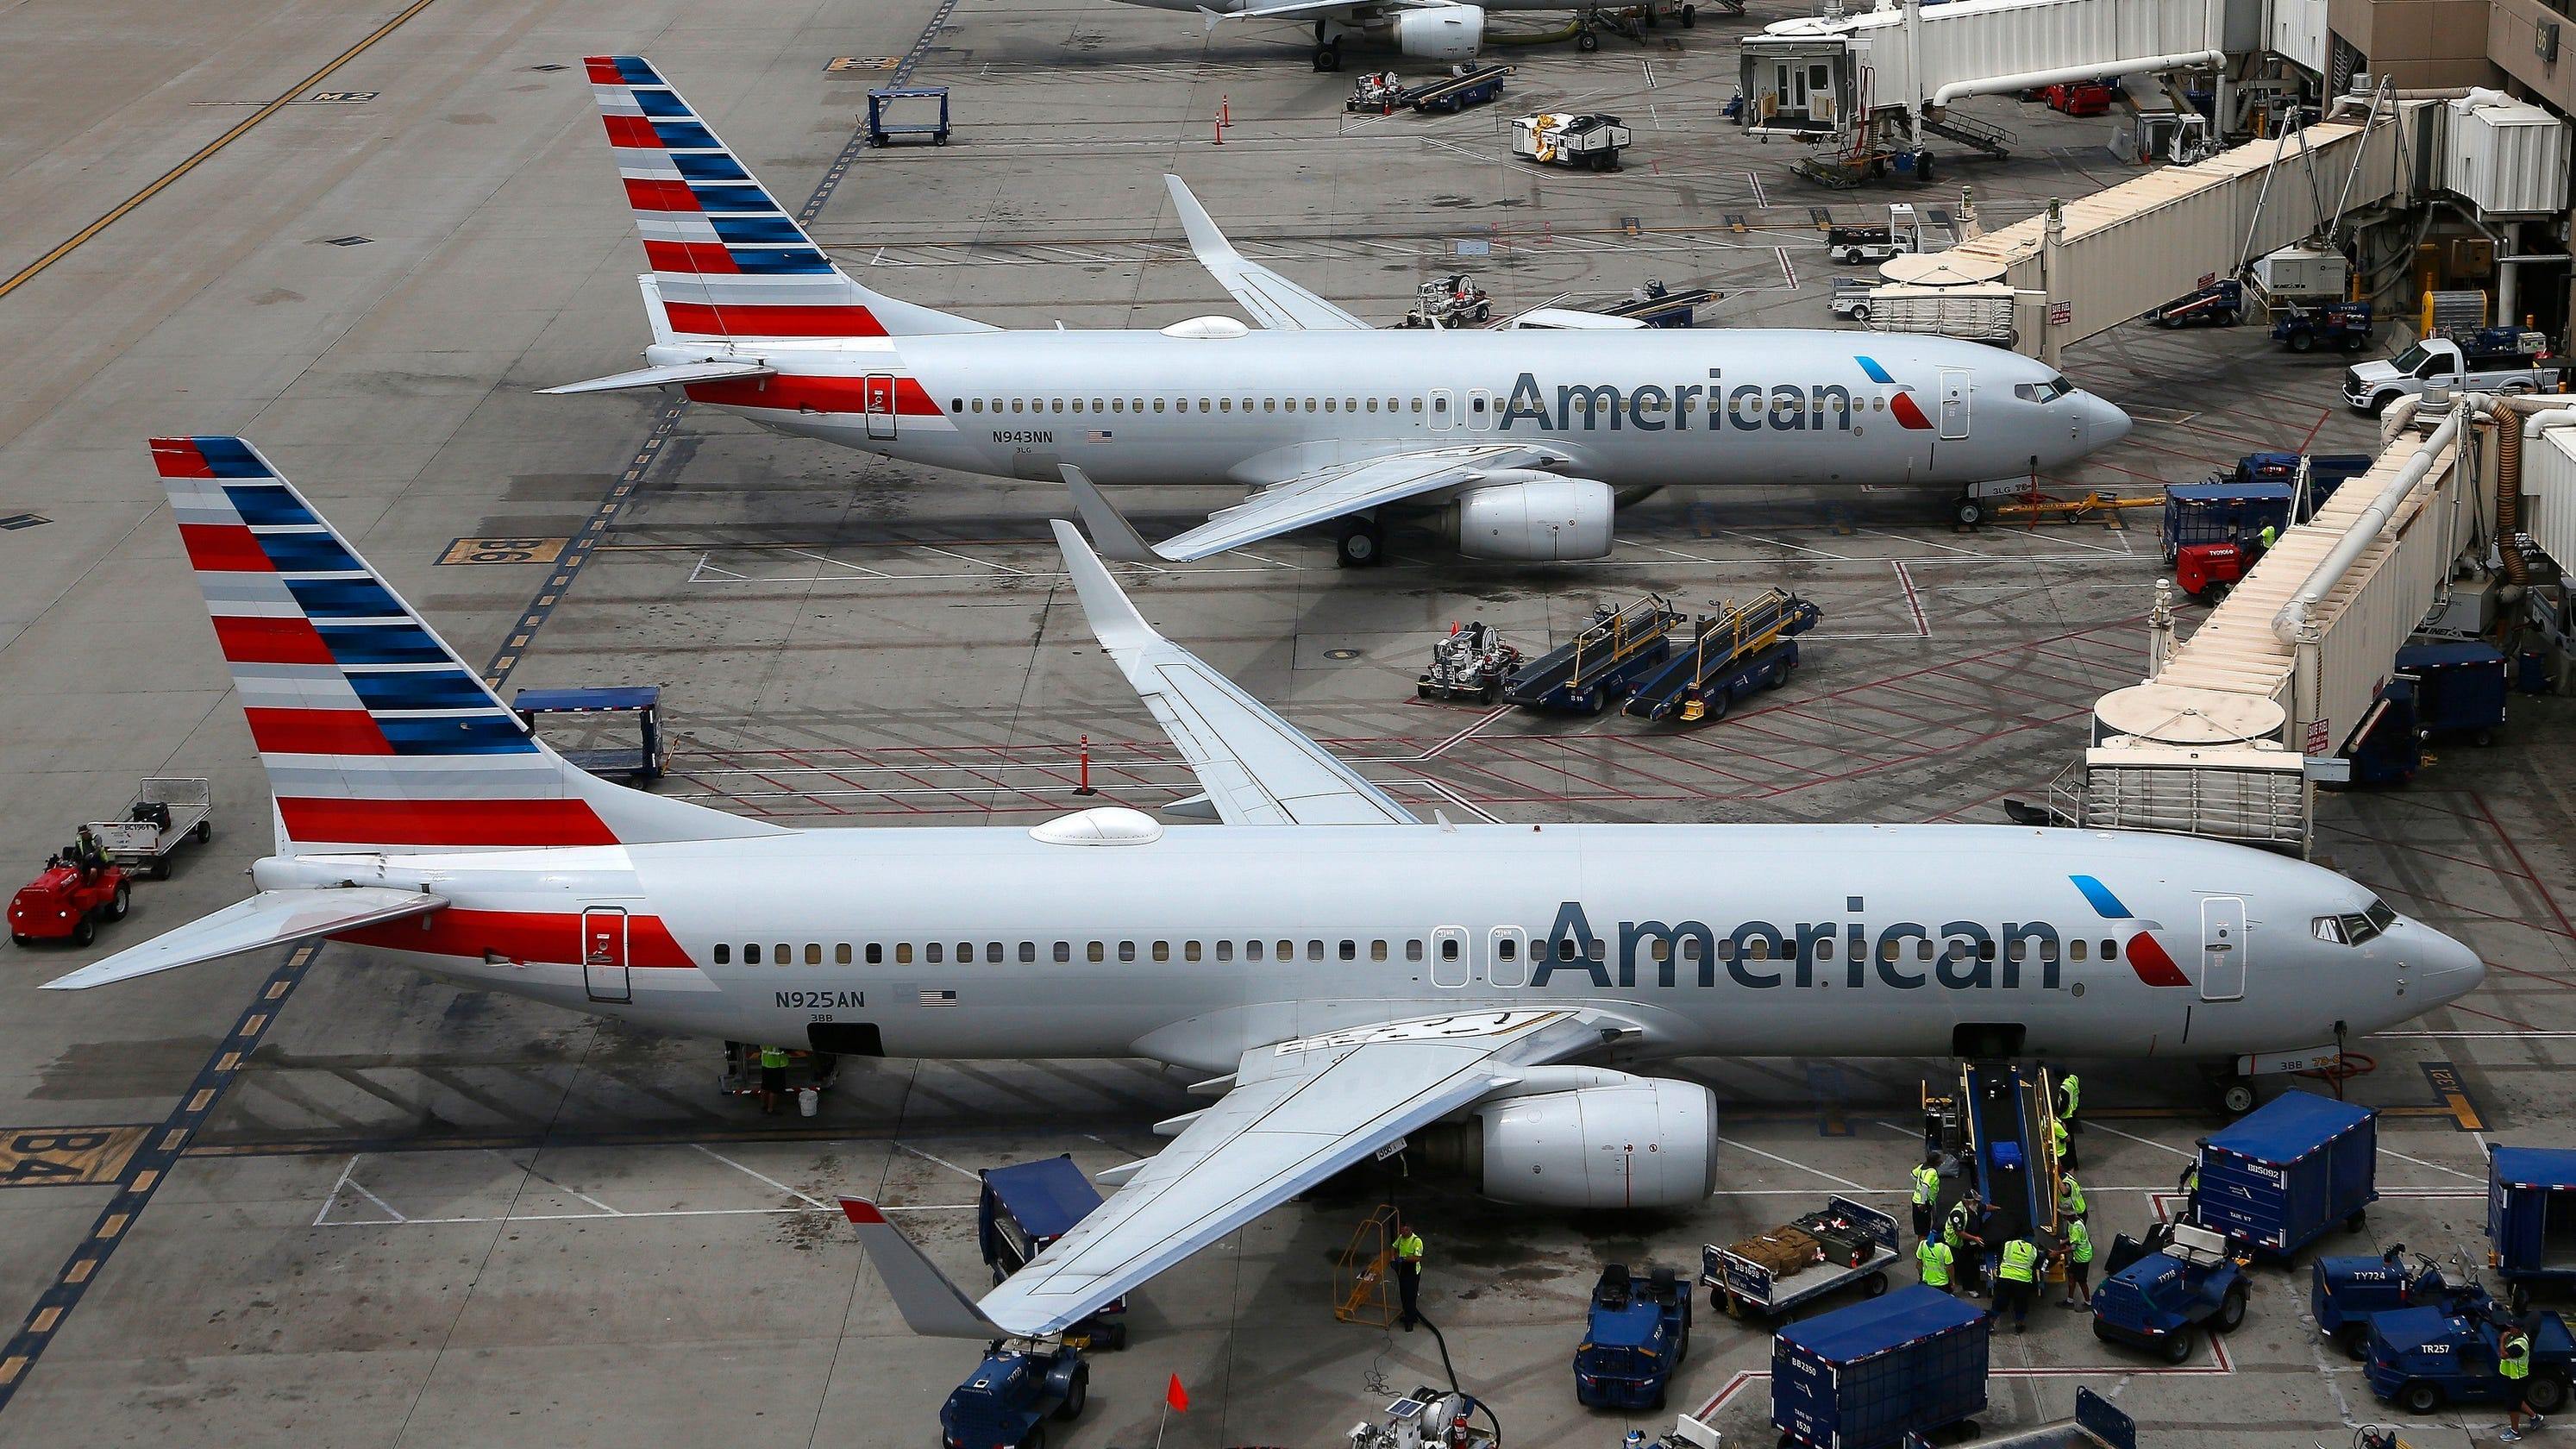 American Airlines fliers sharing horror stories online